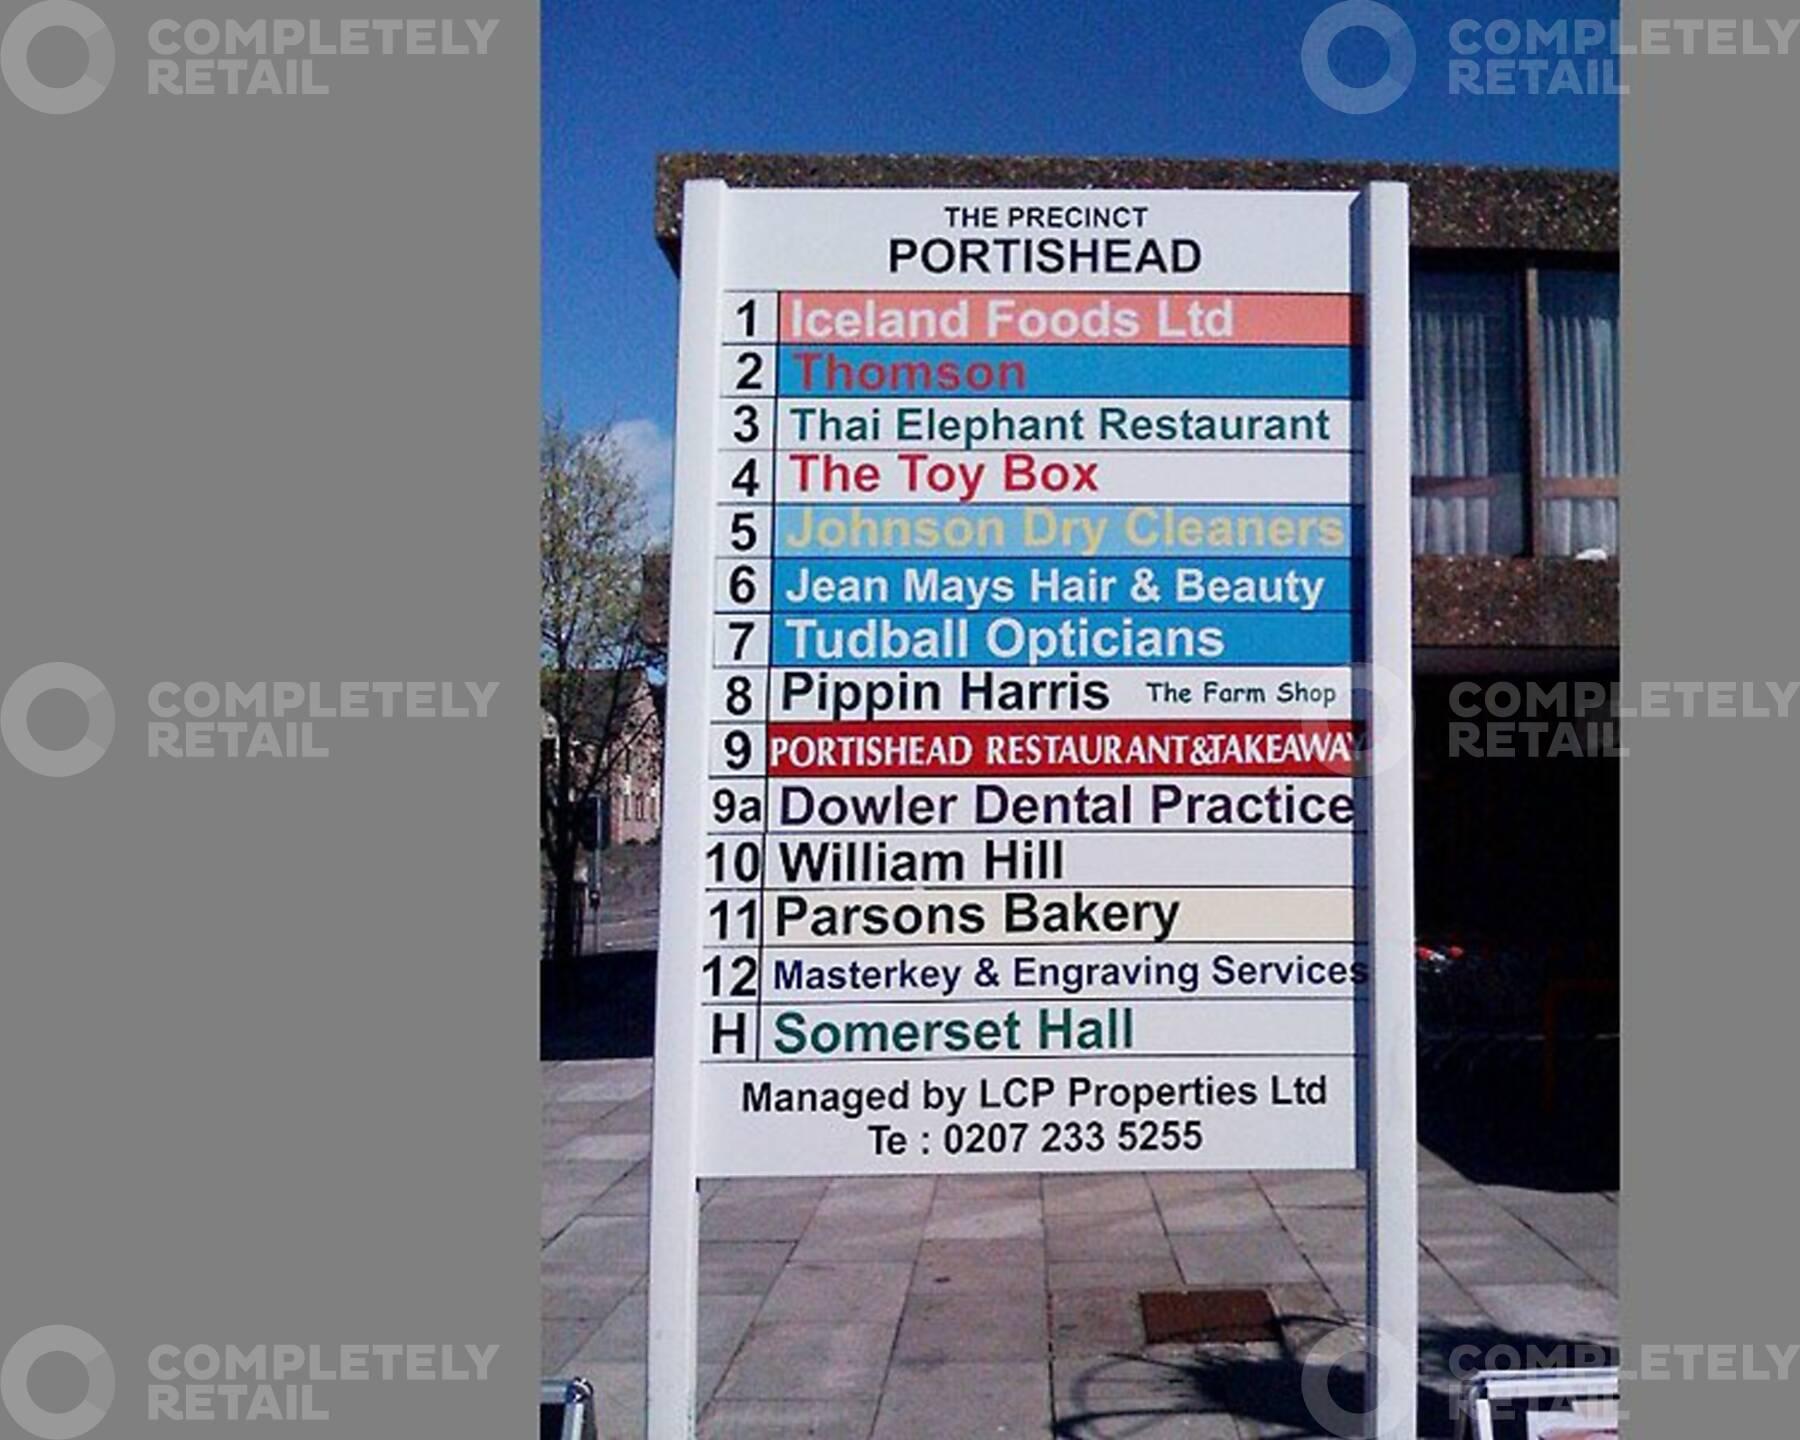 The Precinct Portishead